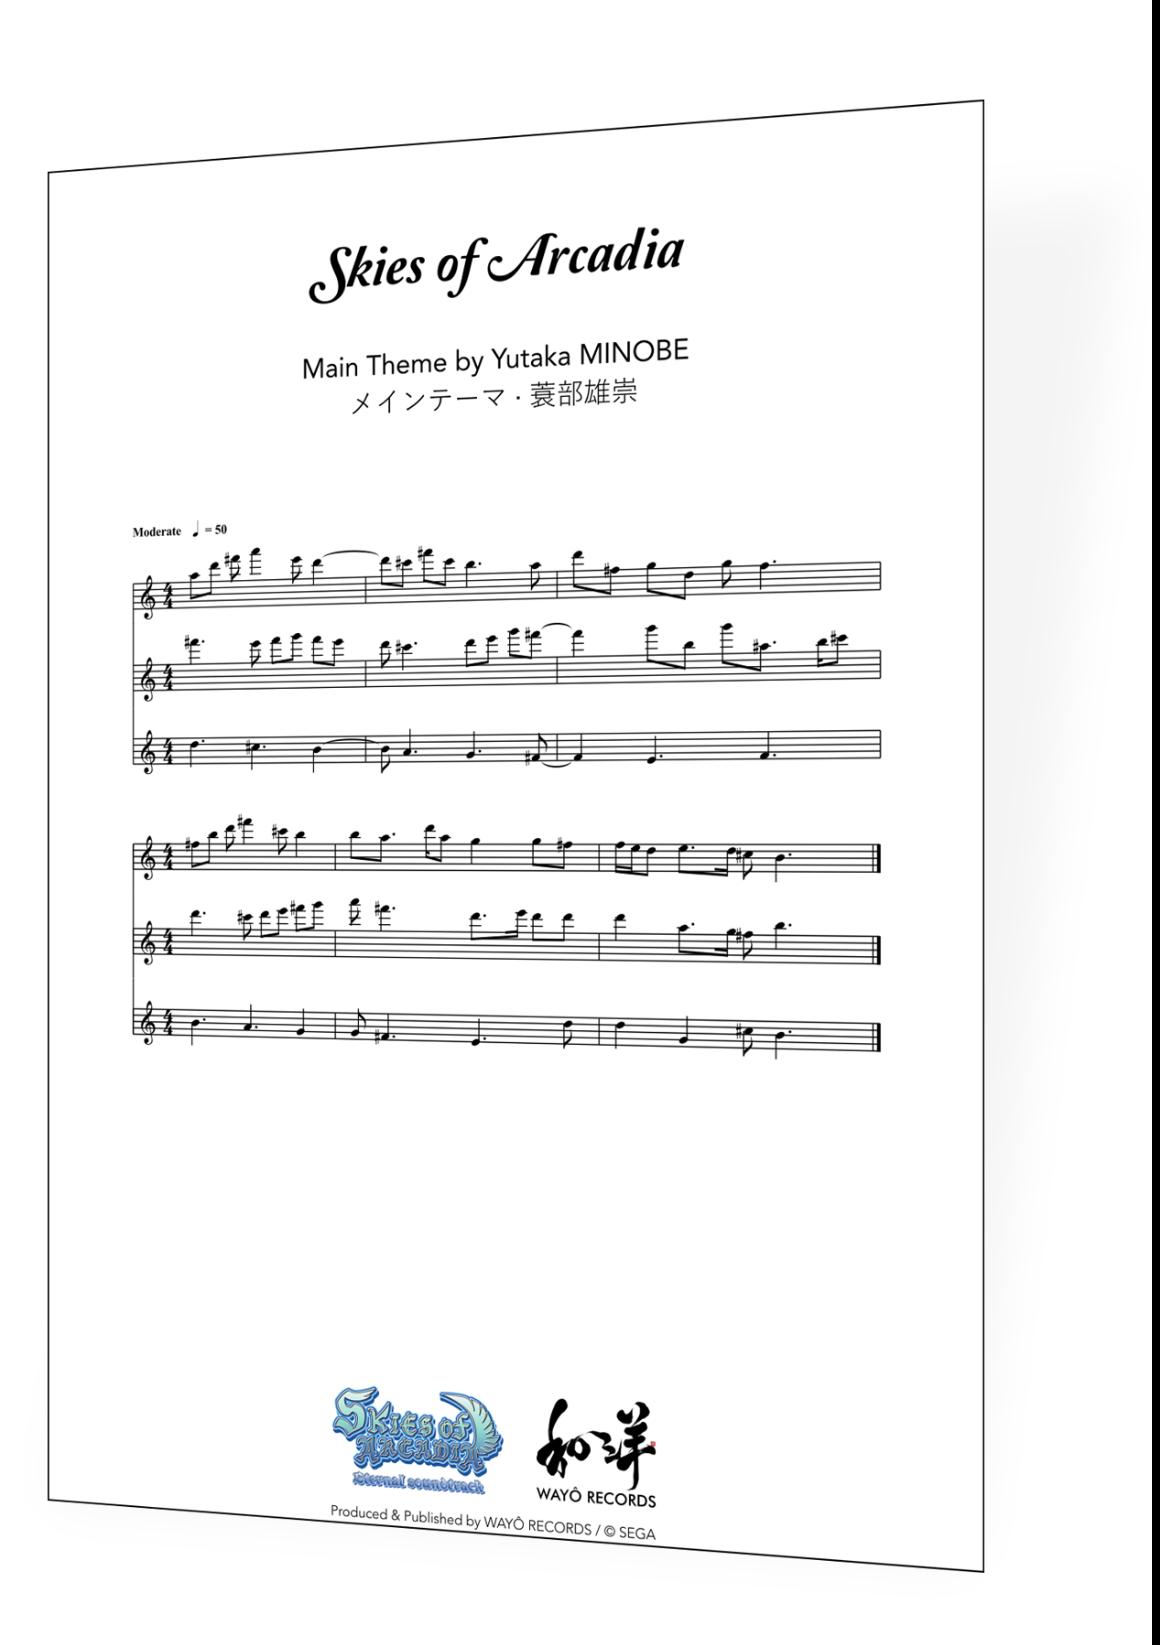 Skies of Arcadia Signed Music Sheet